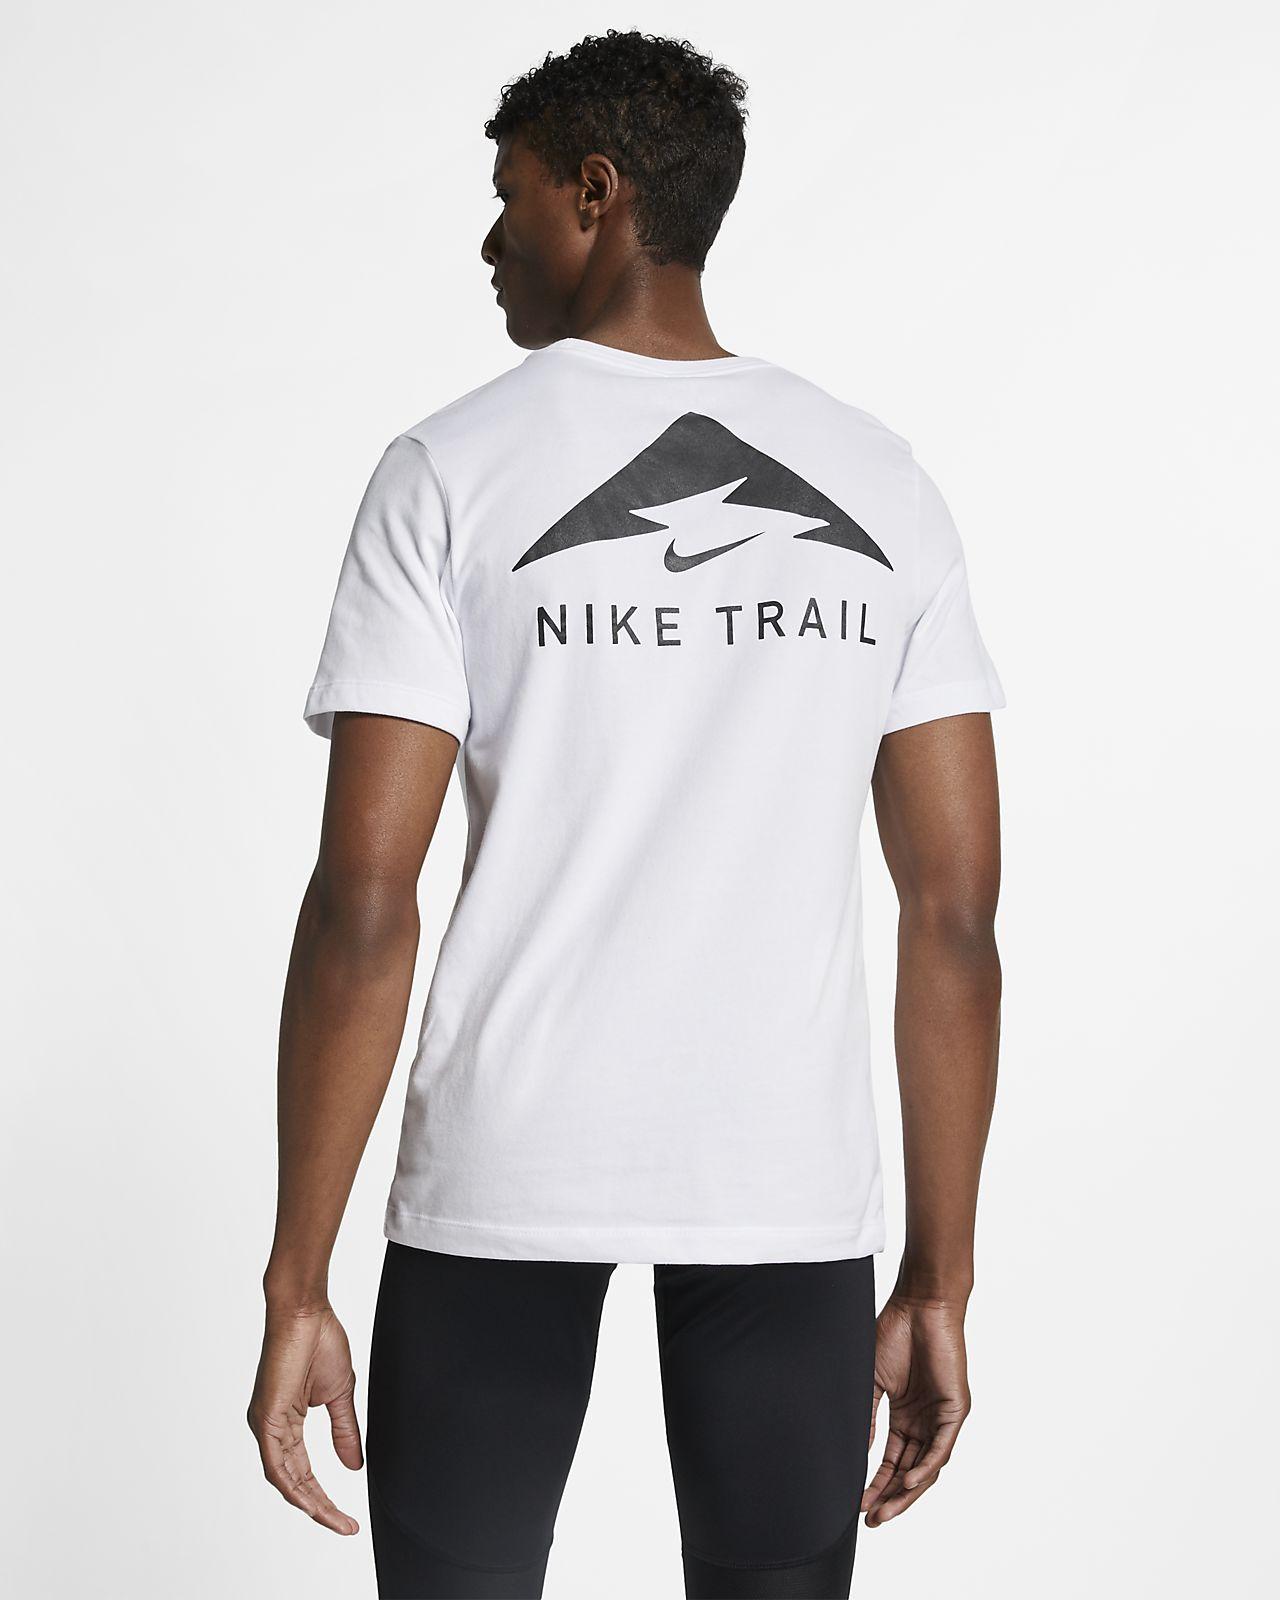 7fc6d53d07143 Nike Trail Dri-FIT Men's Running T-Shirt. Nike.com NO